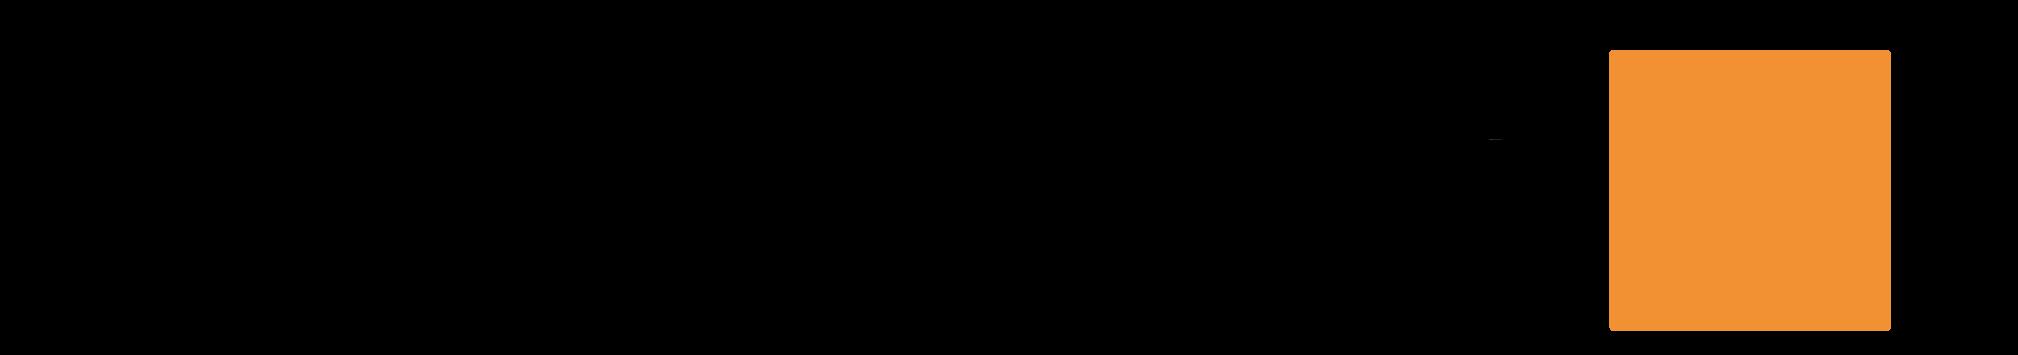 Sojag Logo Black